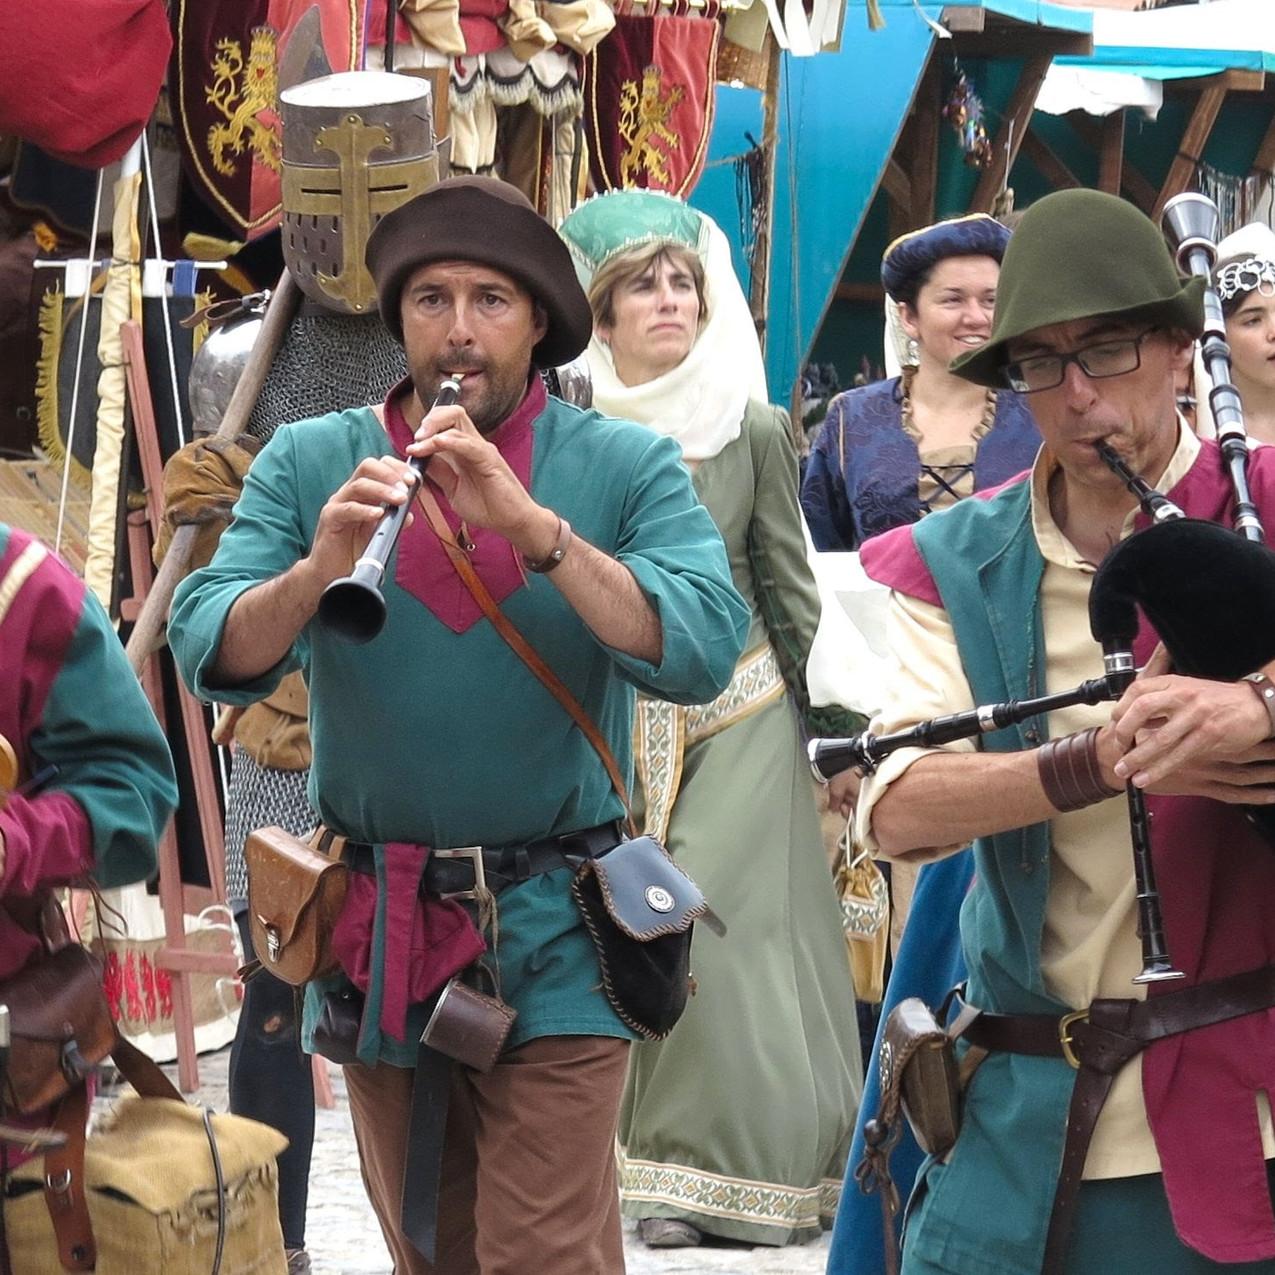 Medieval street parade in Obidos